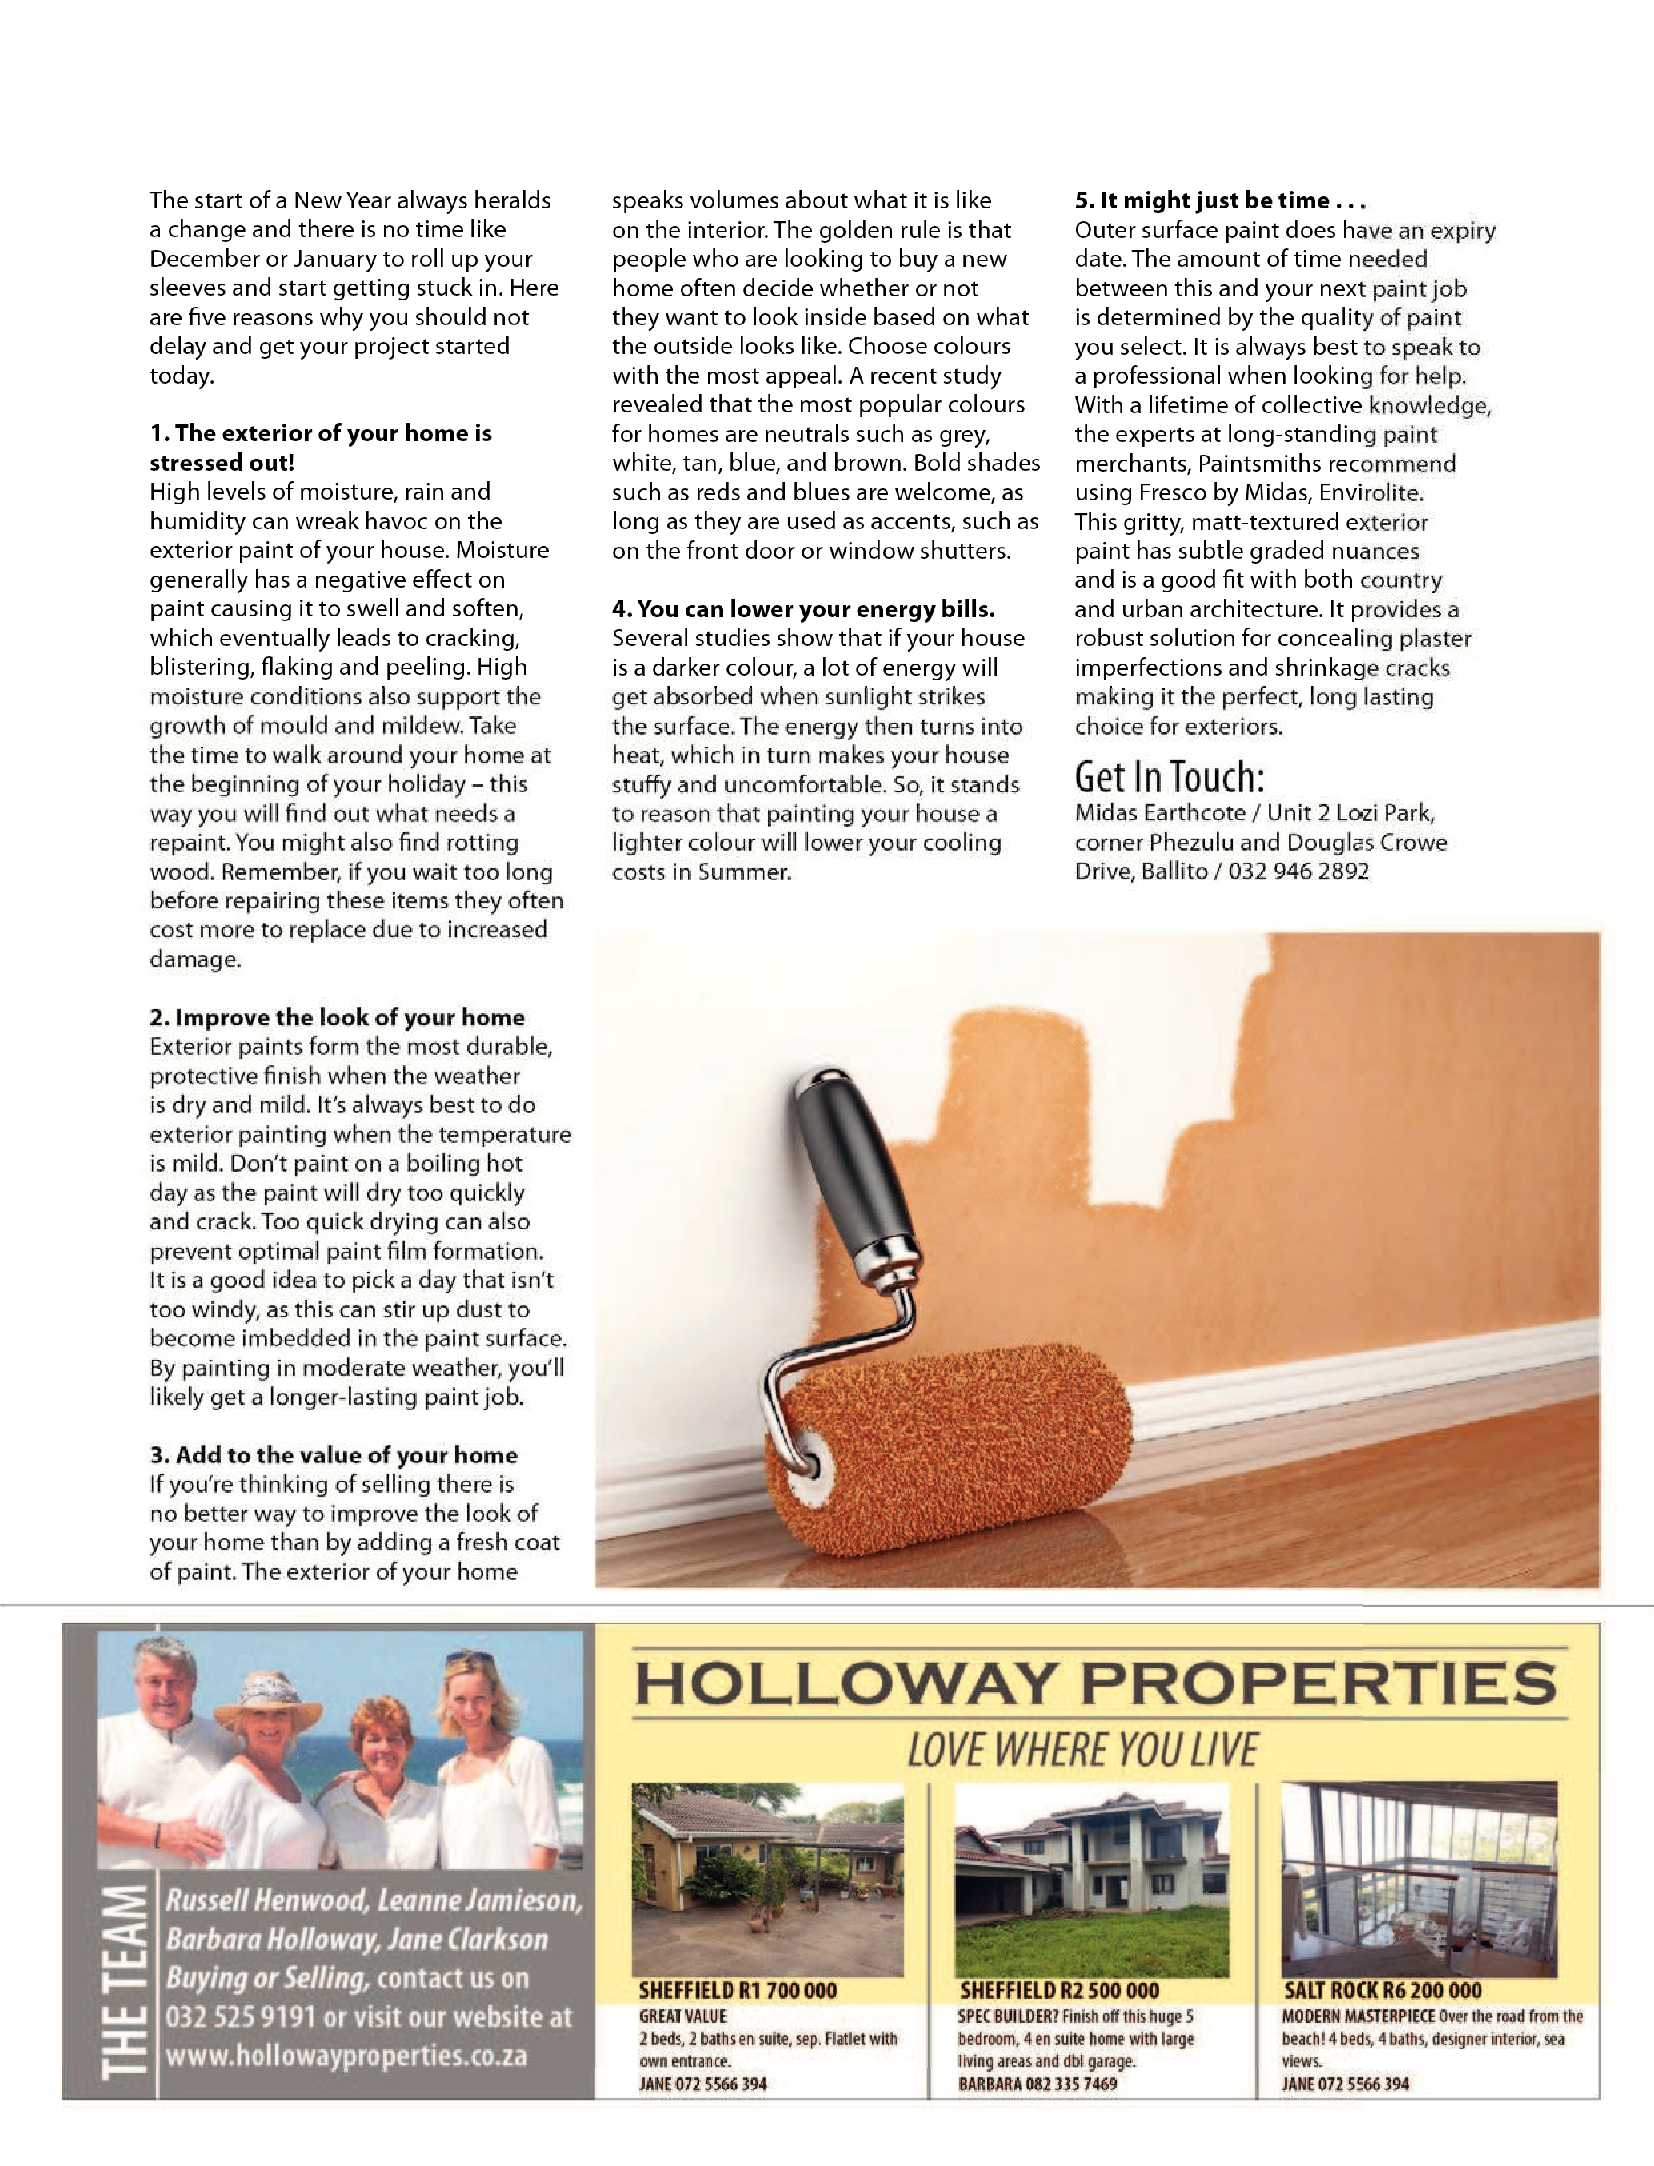 get-magazine-ballitoumhlanga-december-2016-january-2017-epapers-page-101